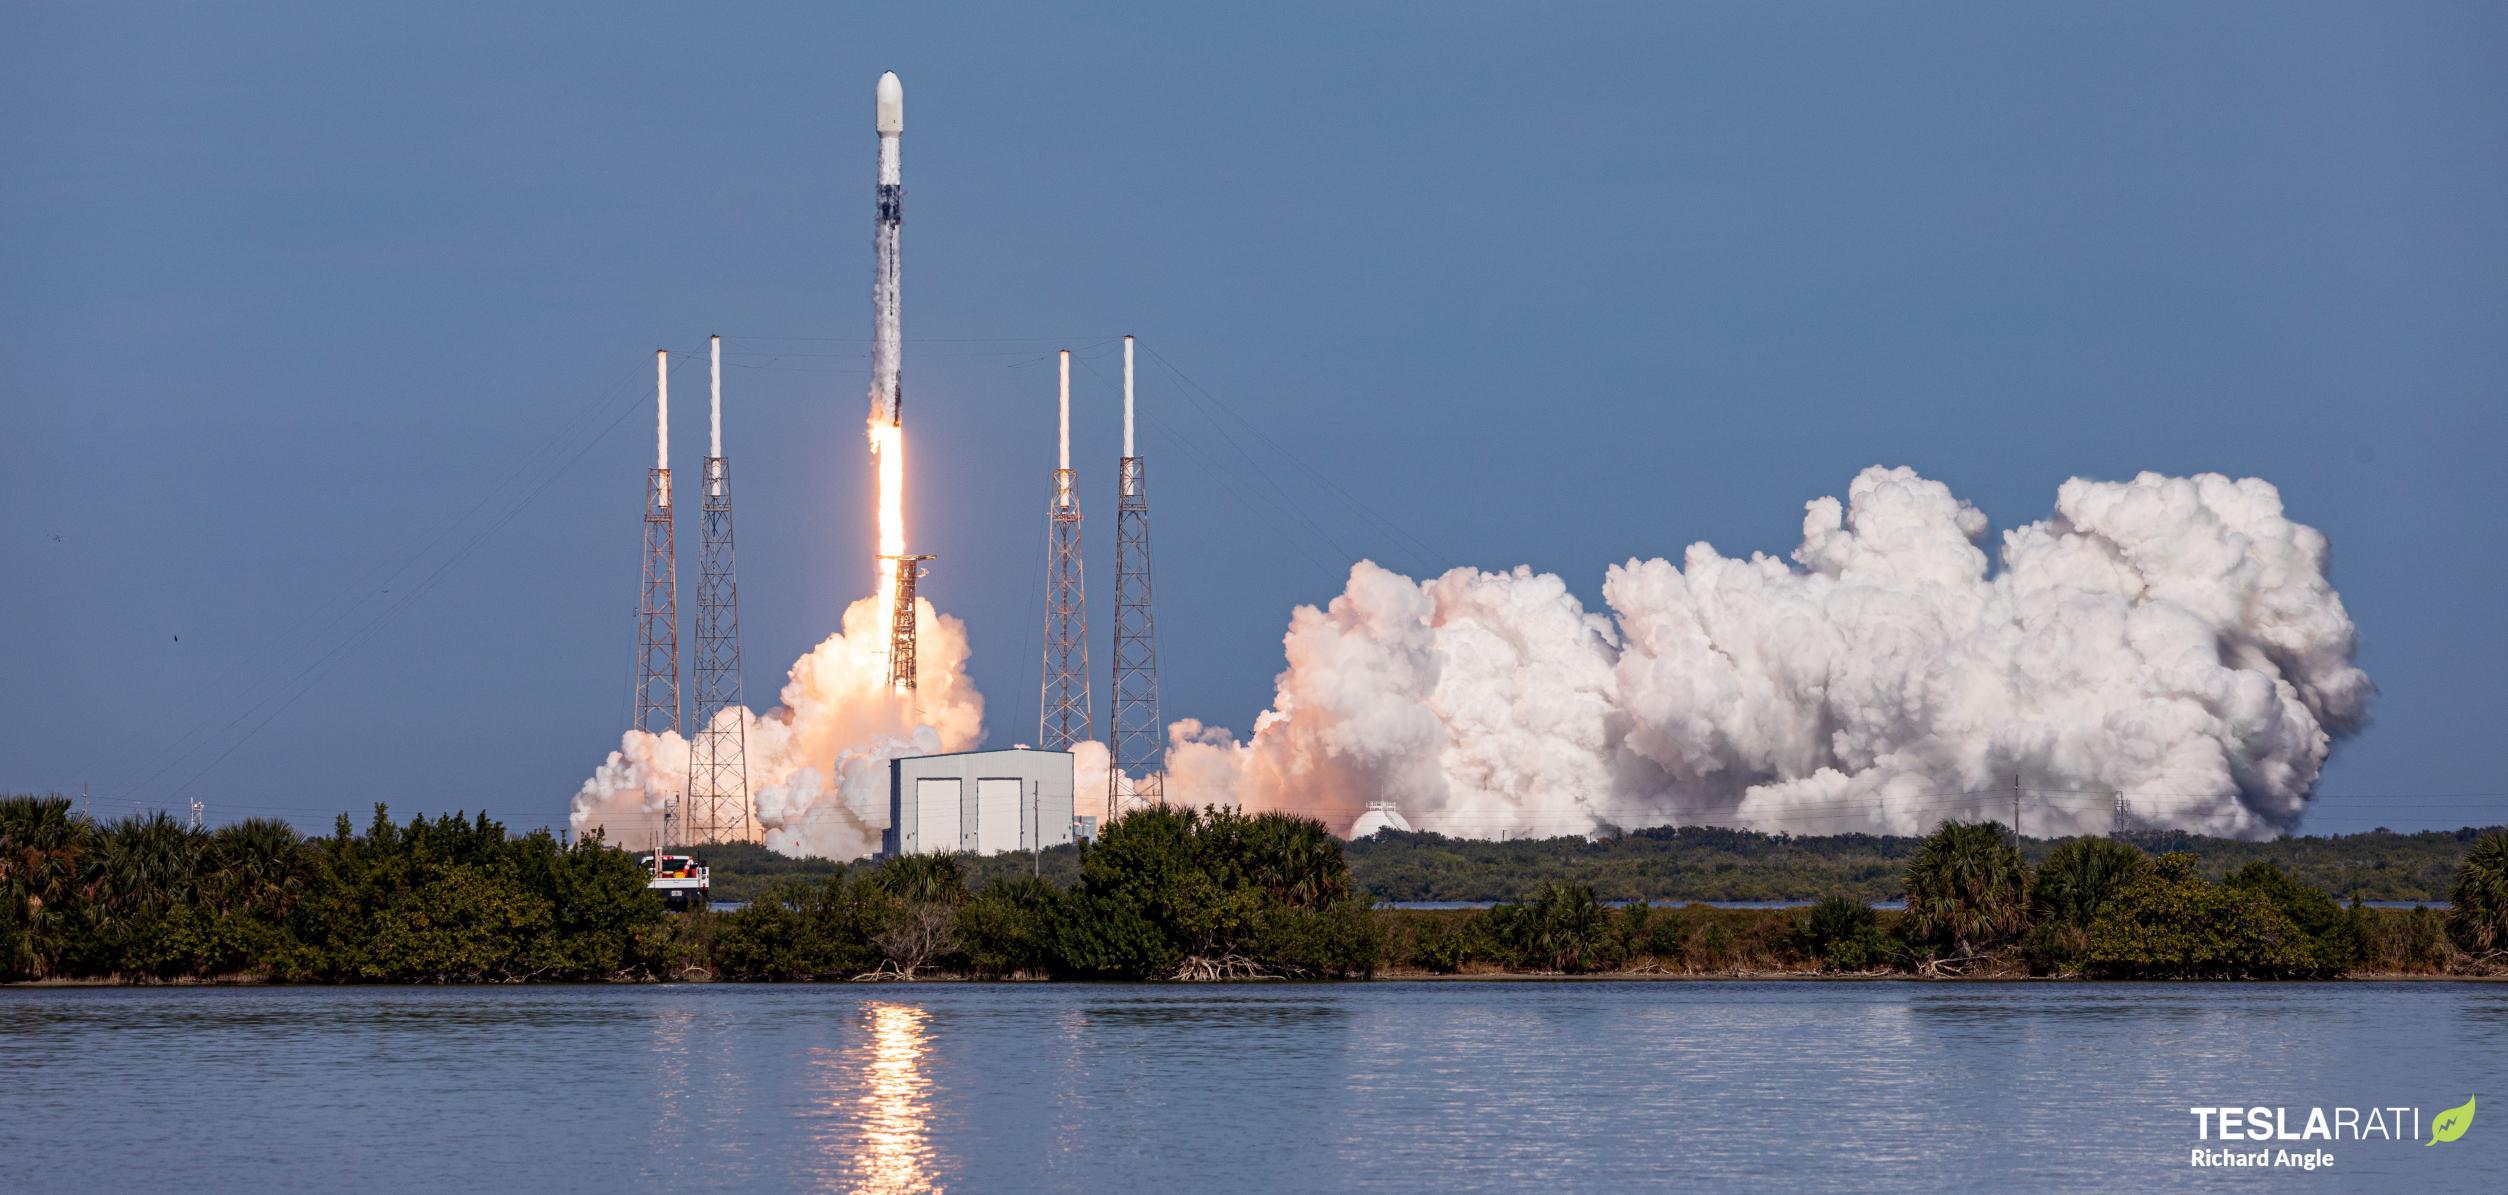 SXM-7 Falcon 9 B1051 LC-40 121320 (Richard Angle) launch 1 crop (c)